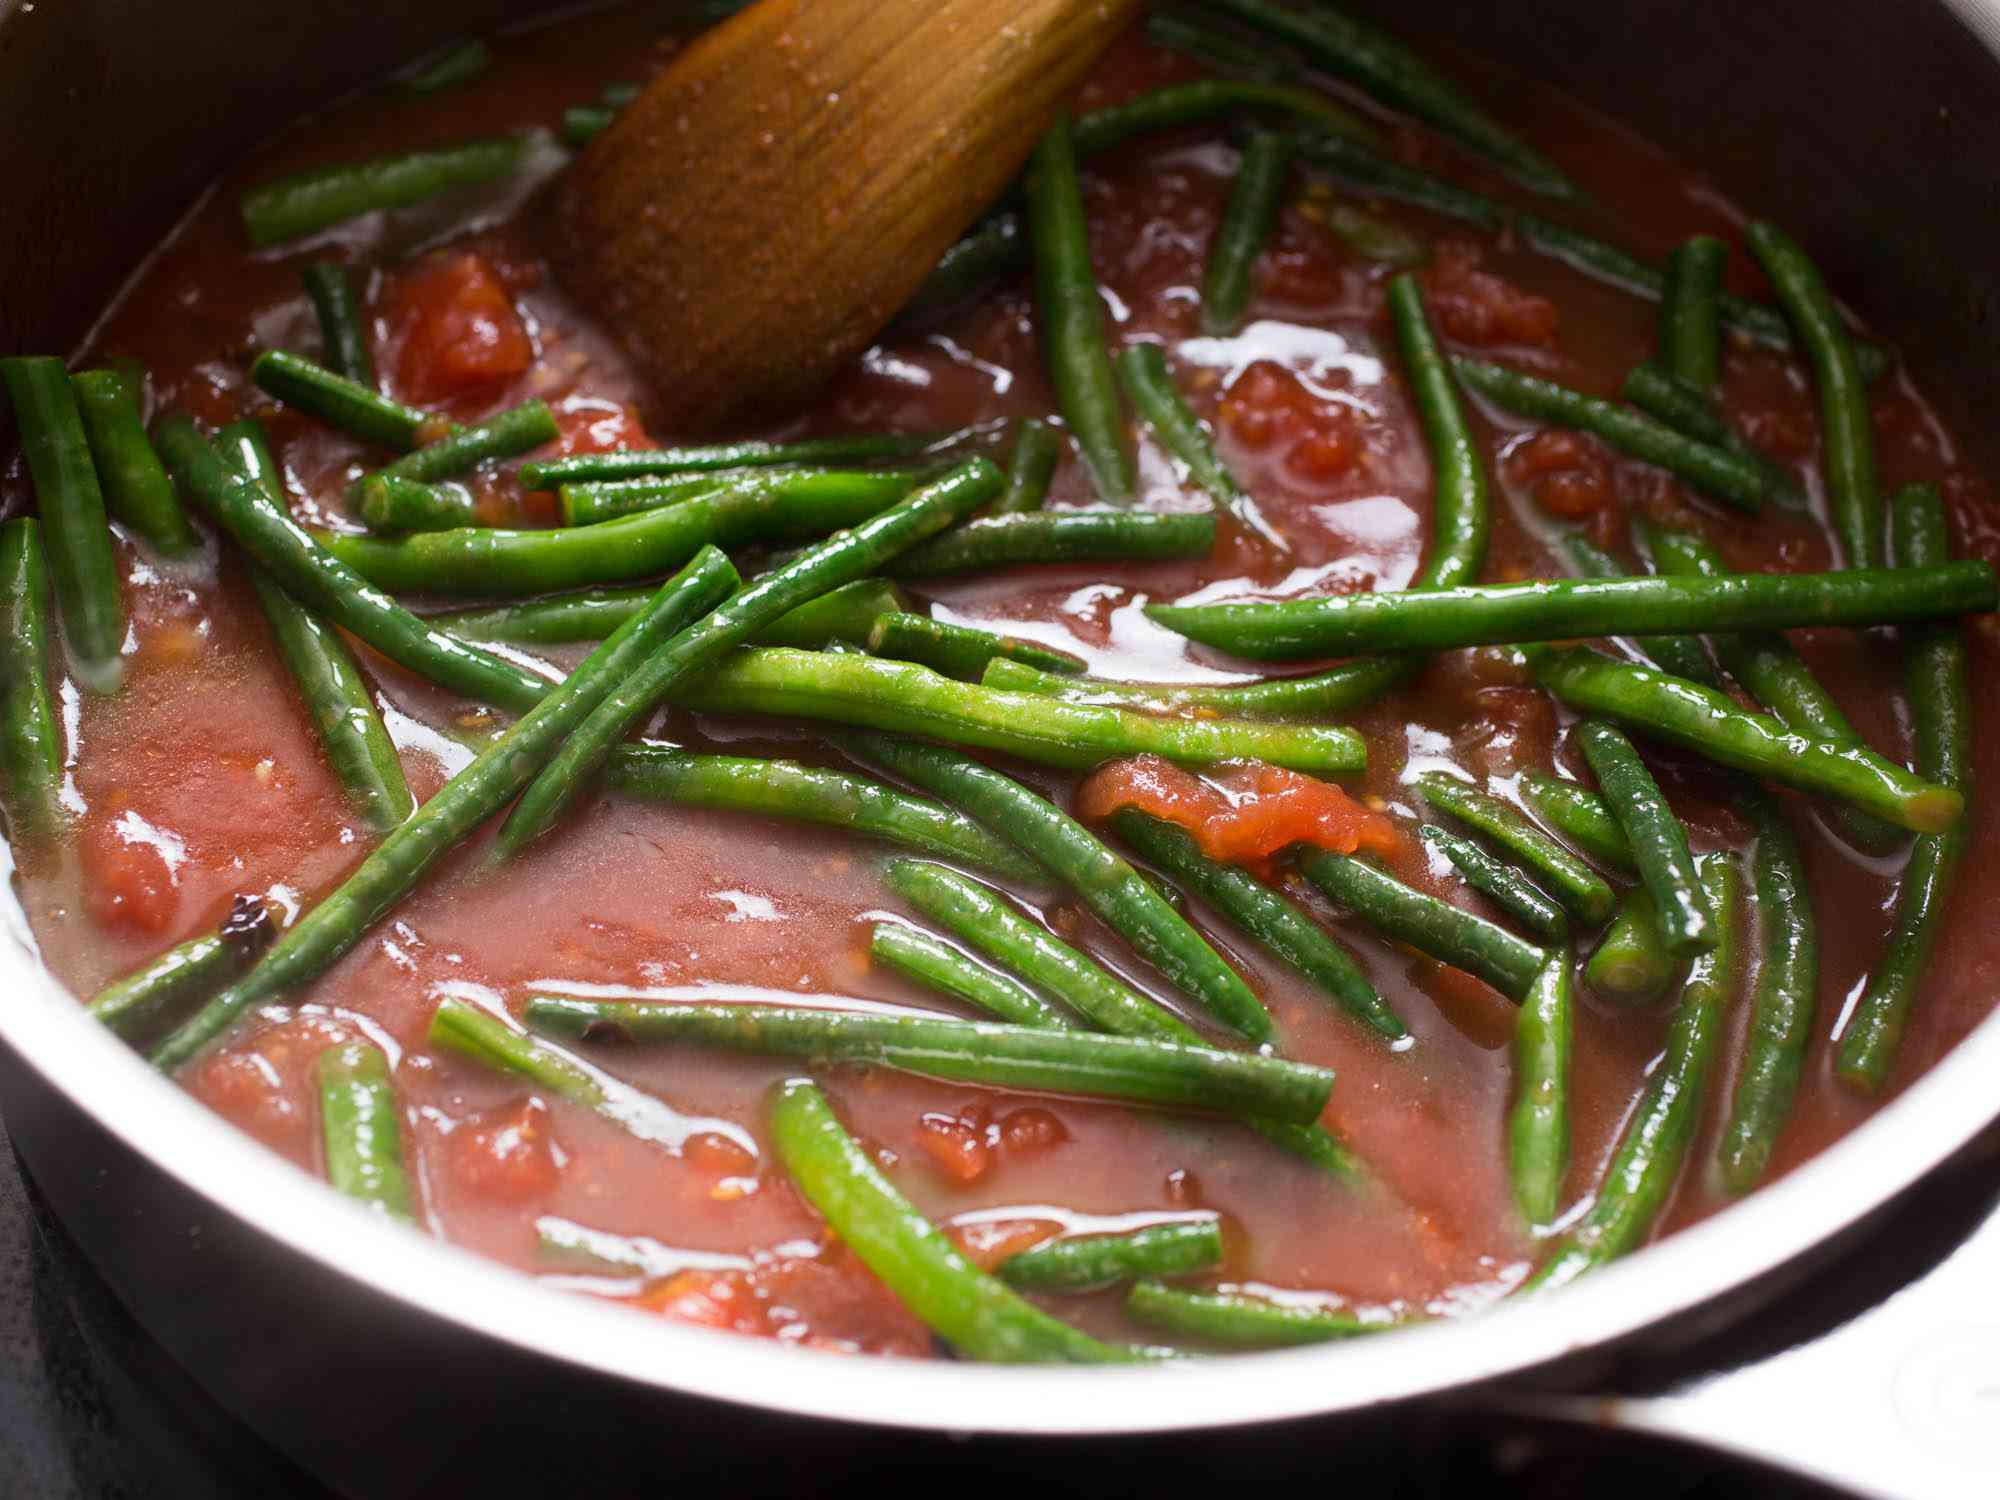 20150715-braised-long-beans-vicky-wasik-6.jpg